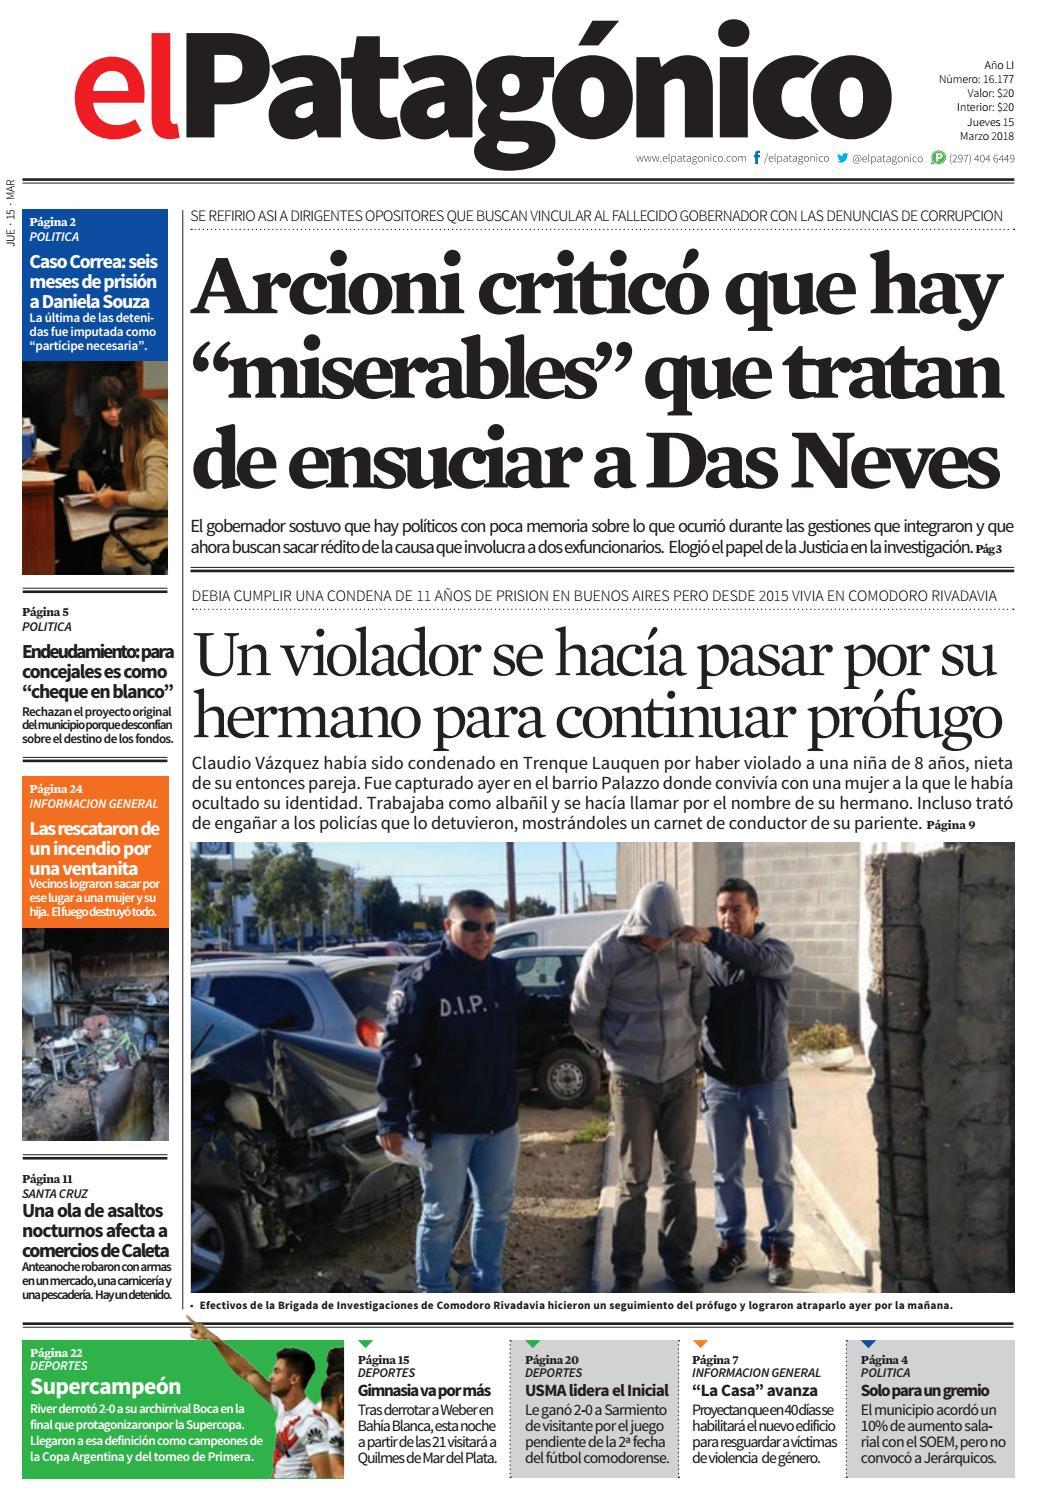 edicion235014032018.pdf by El Patagonico - issuu